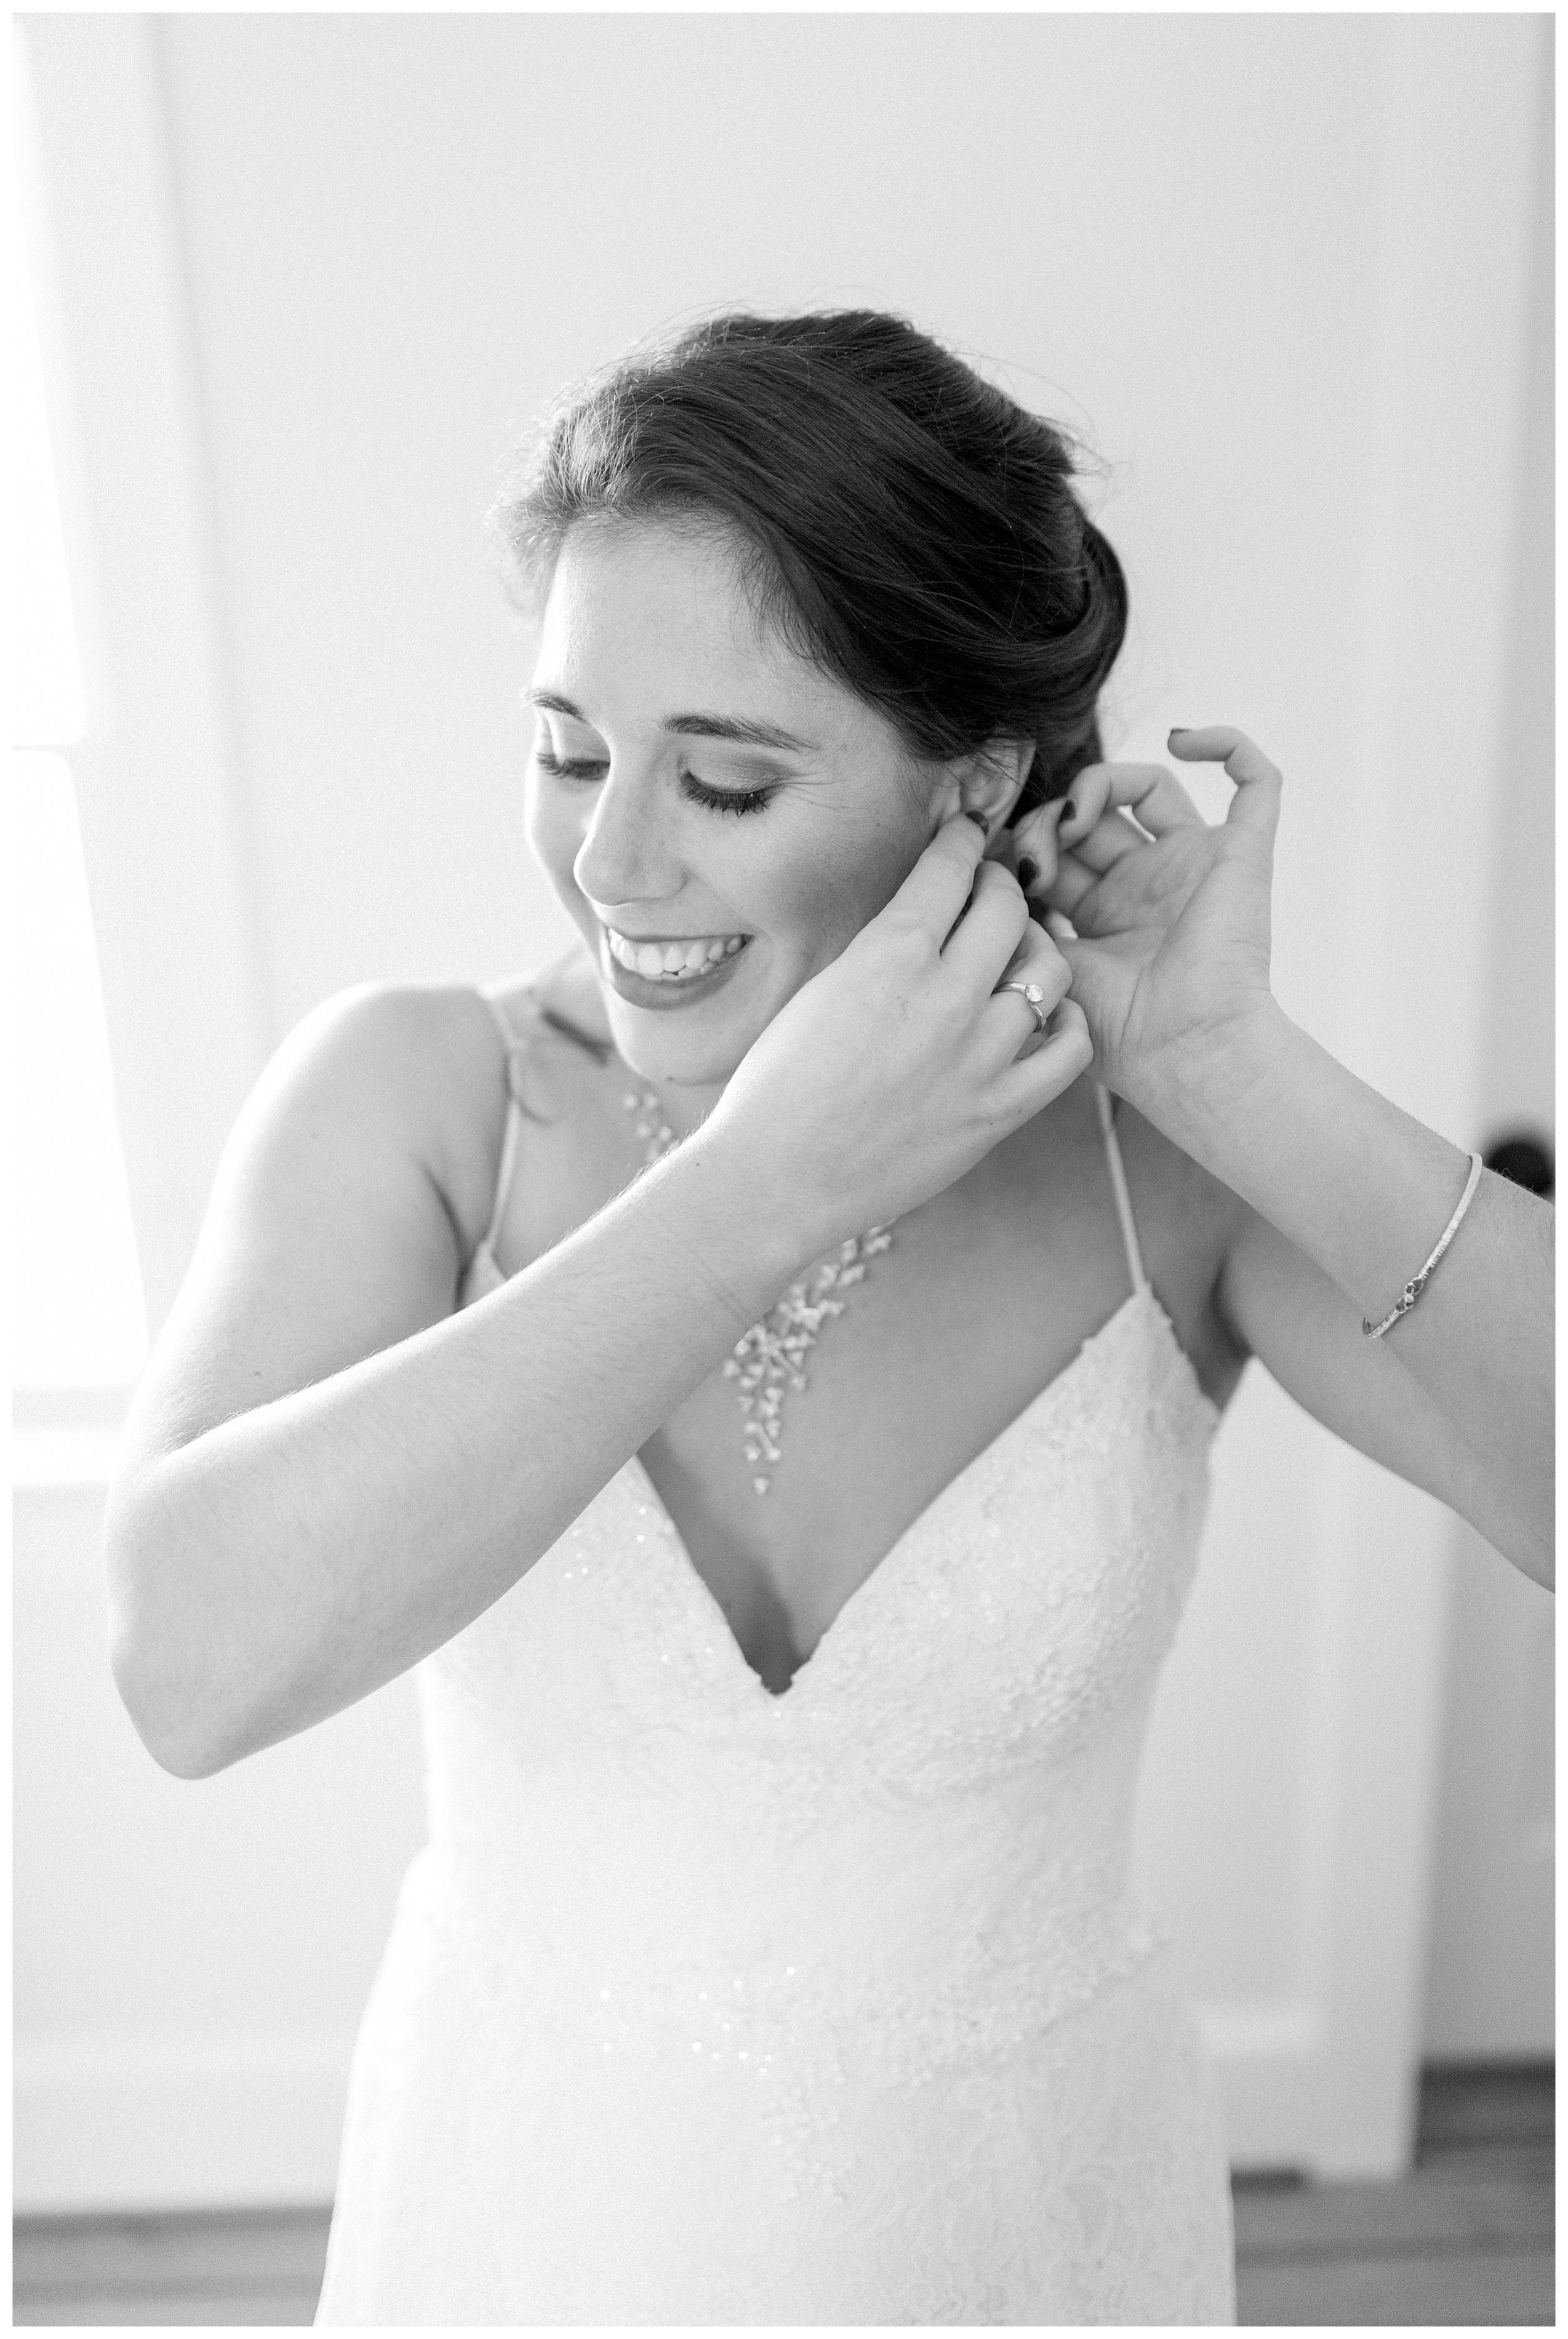 Stone Tower Winery Wedding | Virginia Winter Wedding | VA Wedding Photographer Kir Tuben_0023.jpg